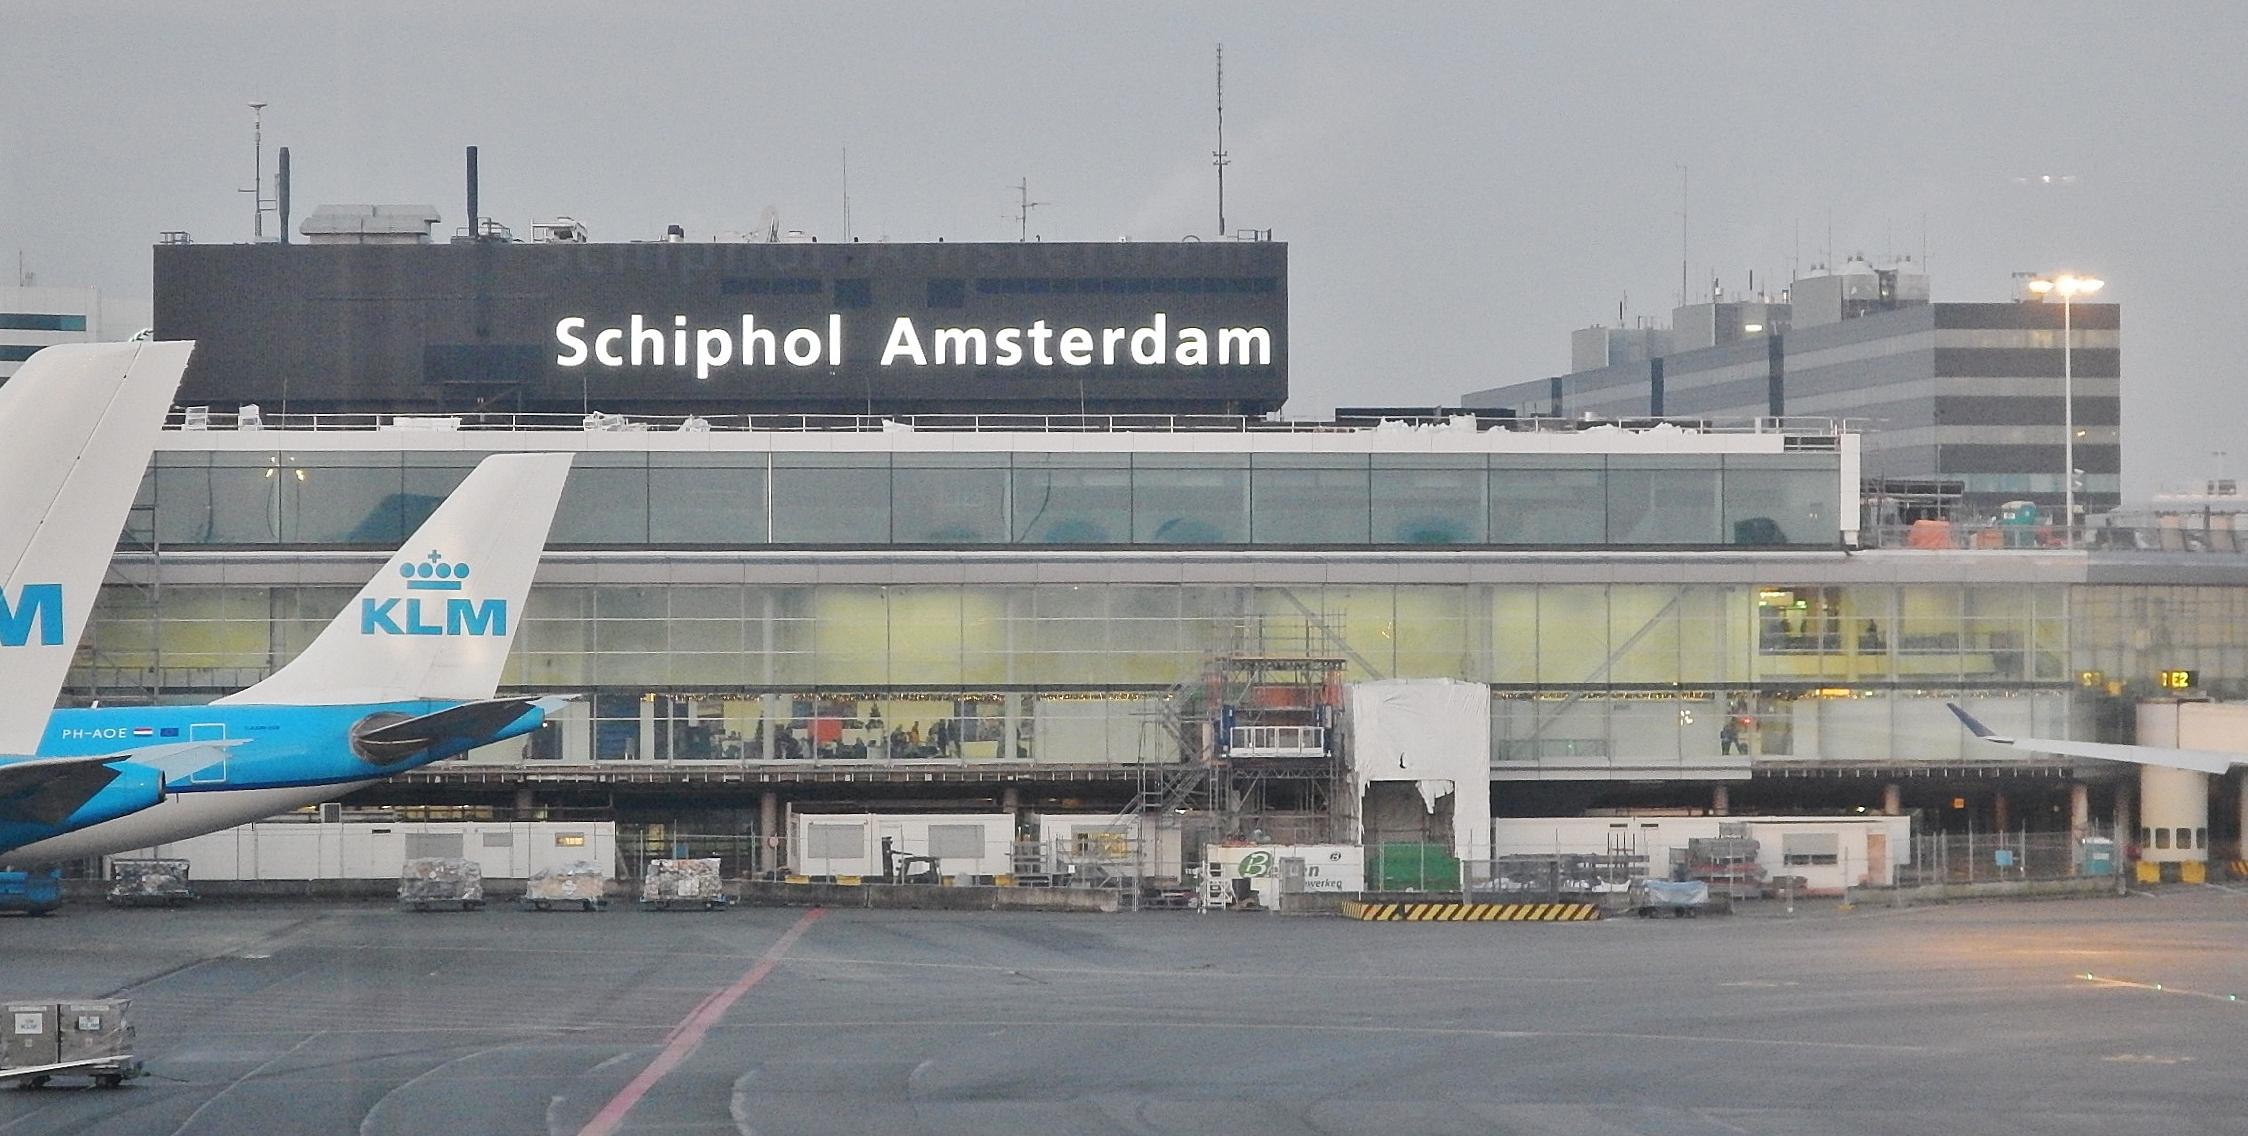 Resultado de imagen para Schiphol Luchthaven